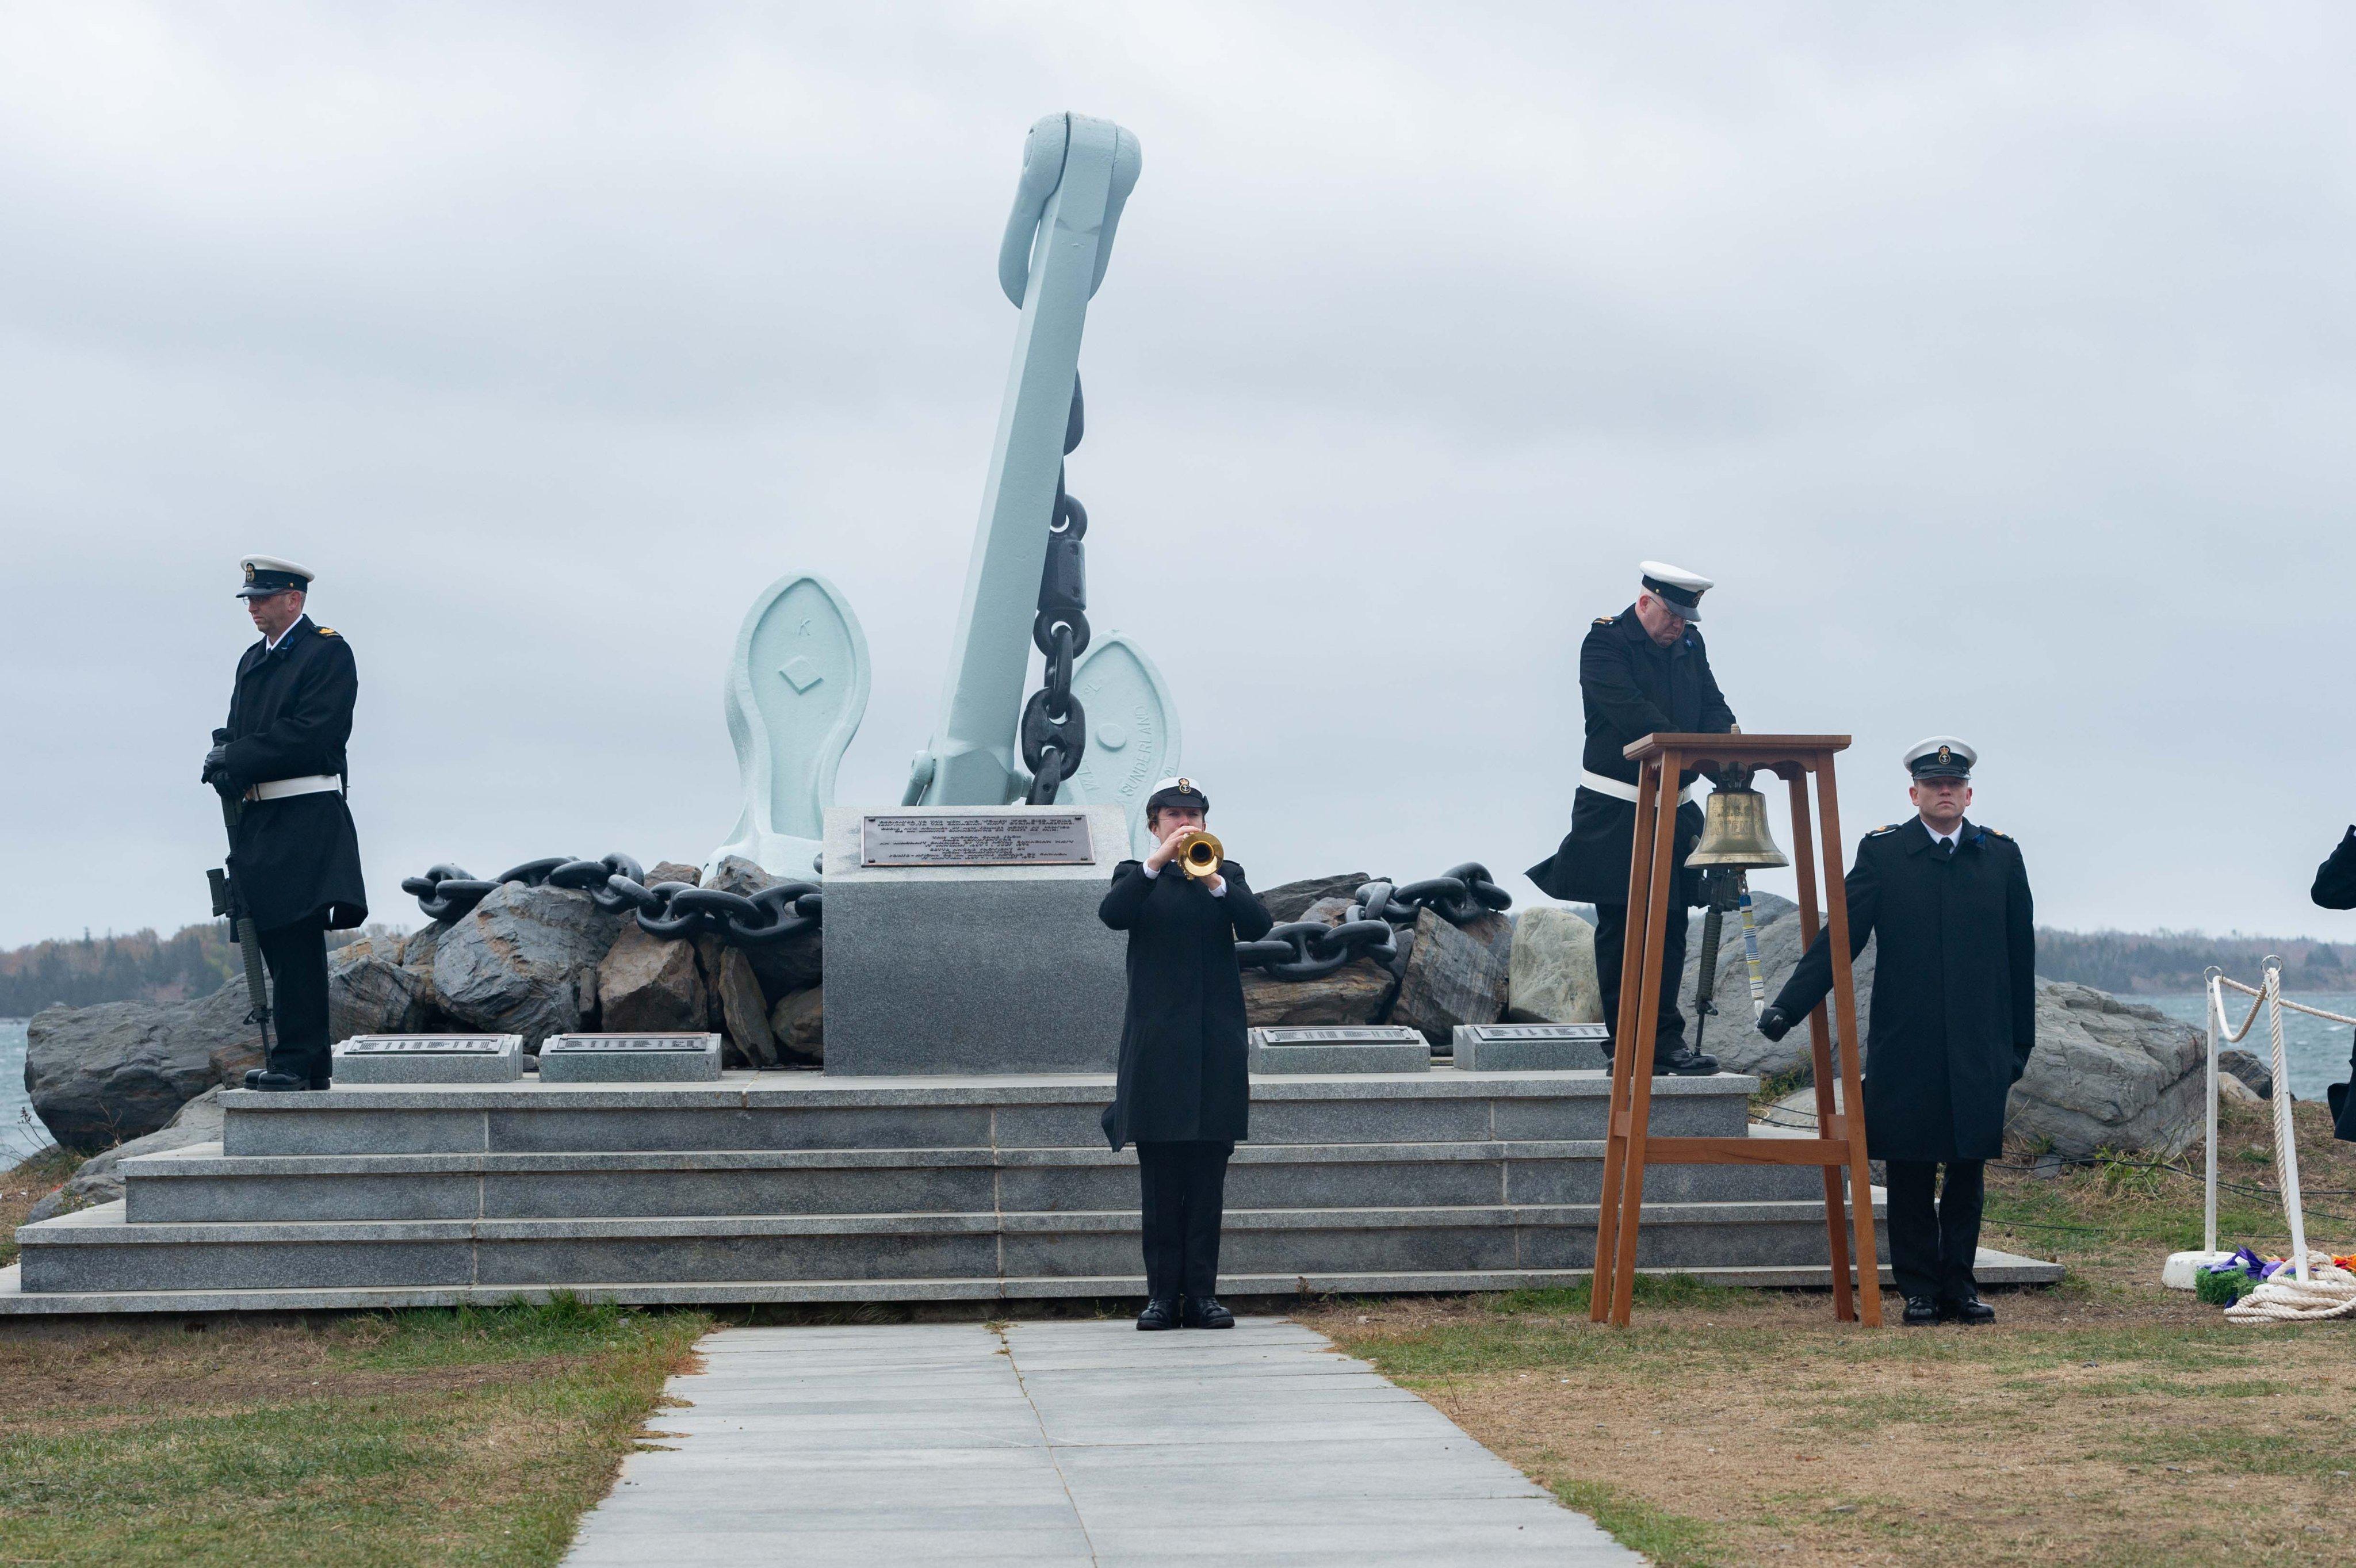 Remembering HMCS Kootenay